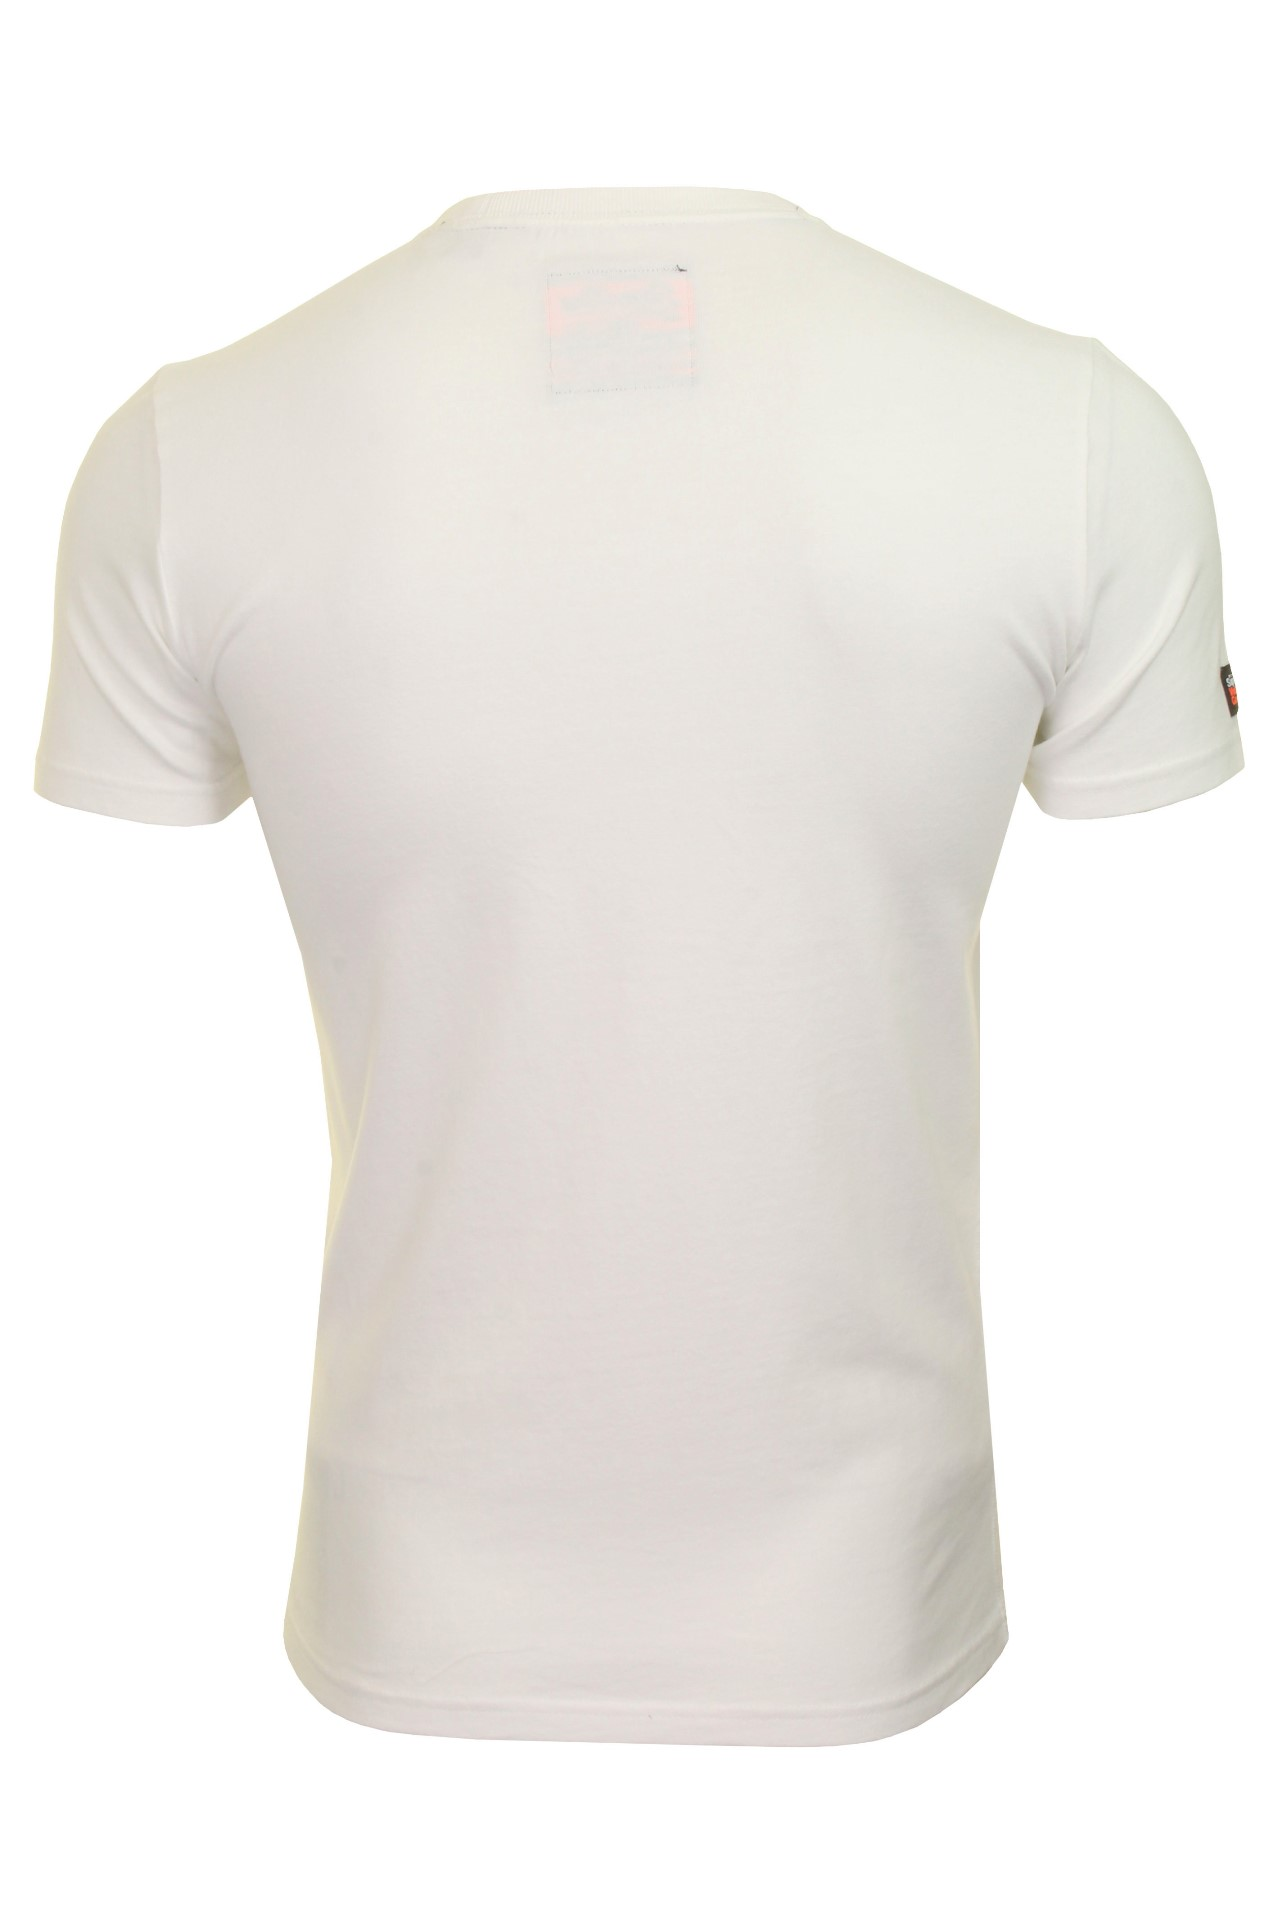 Superdry-039-Monochrome-039-Mens-T-Shirt thumbnail 8